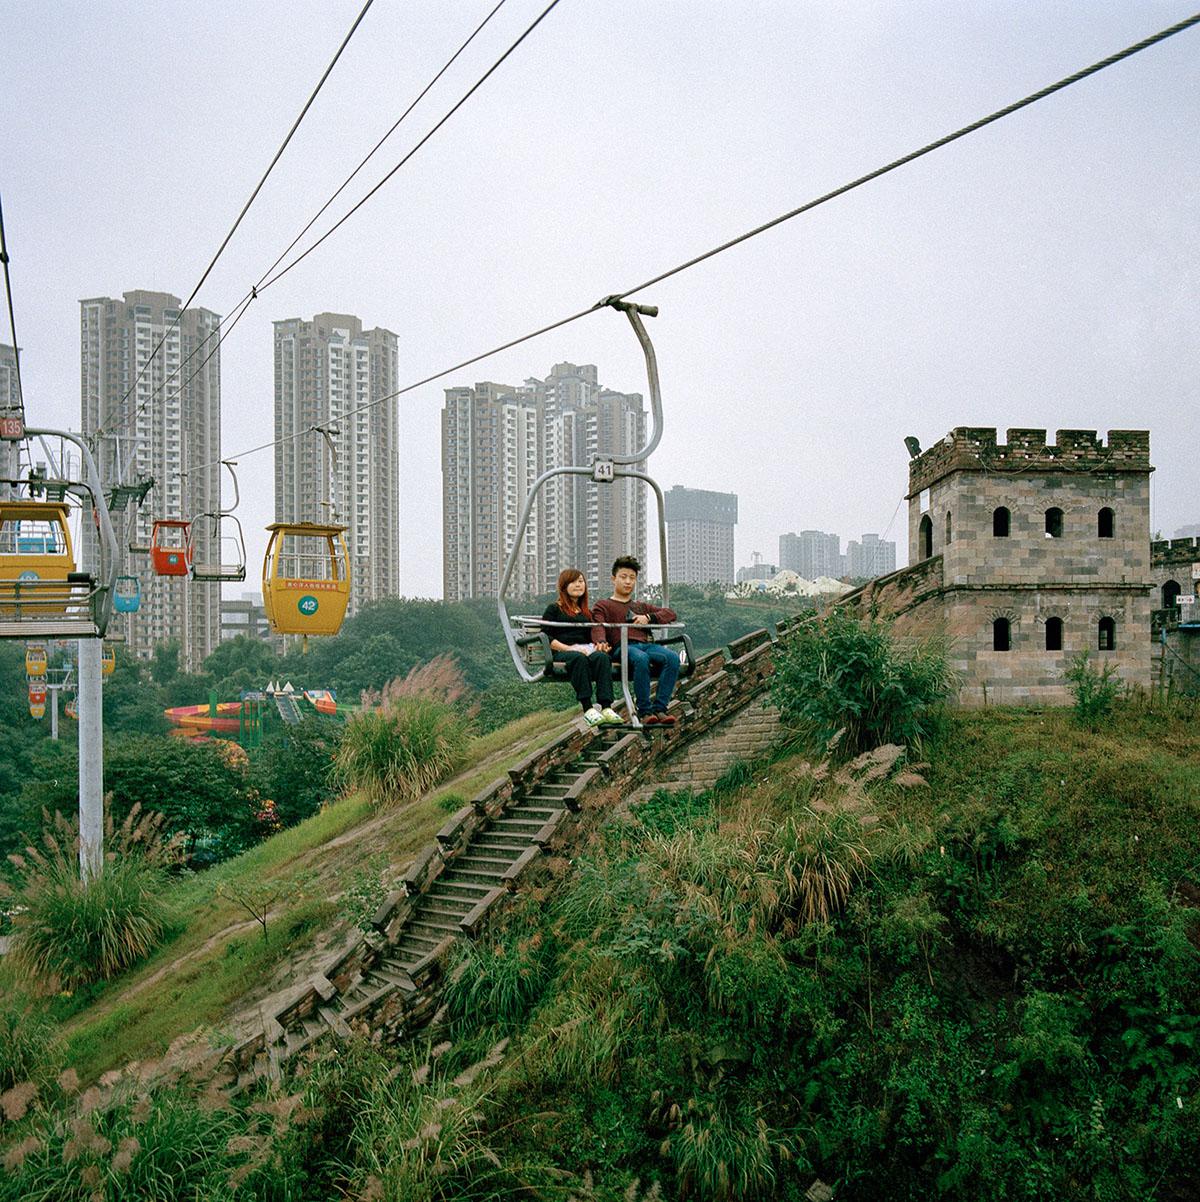 chongqing_TimFranco-0072.jpg